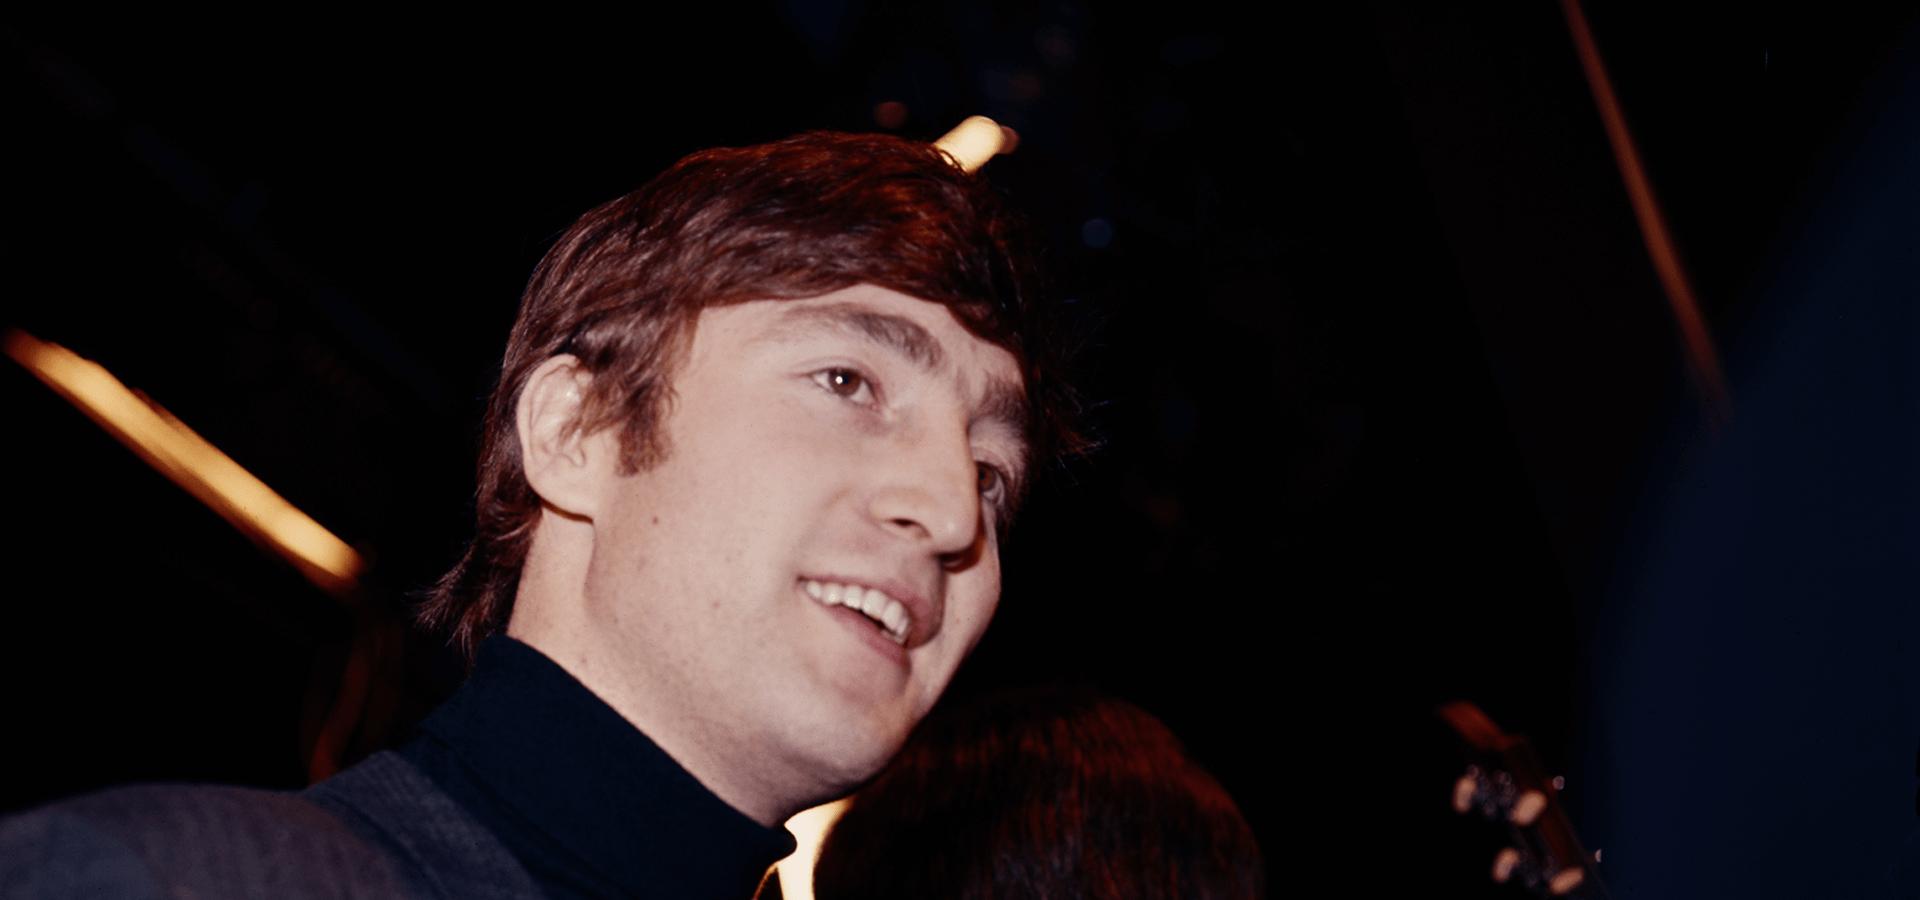 #9 Dream: John Lennon and numerology